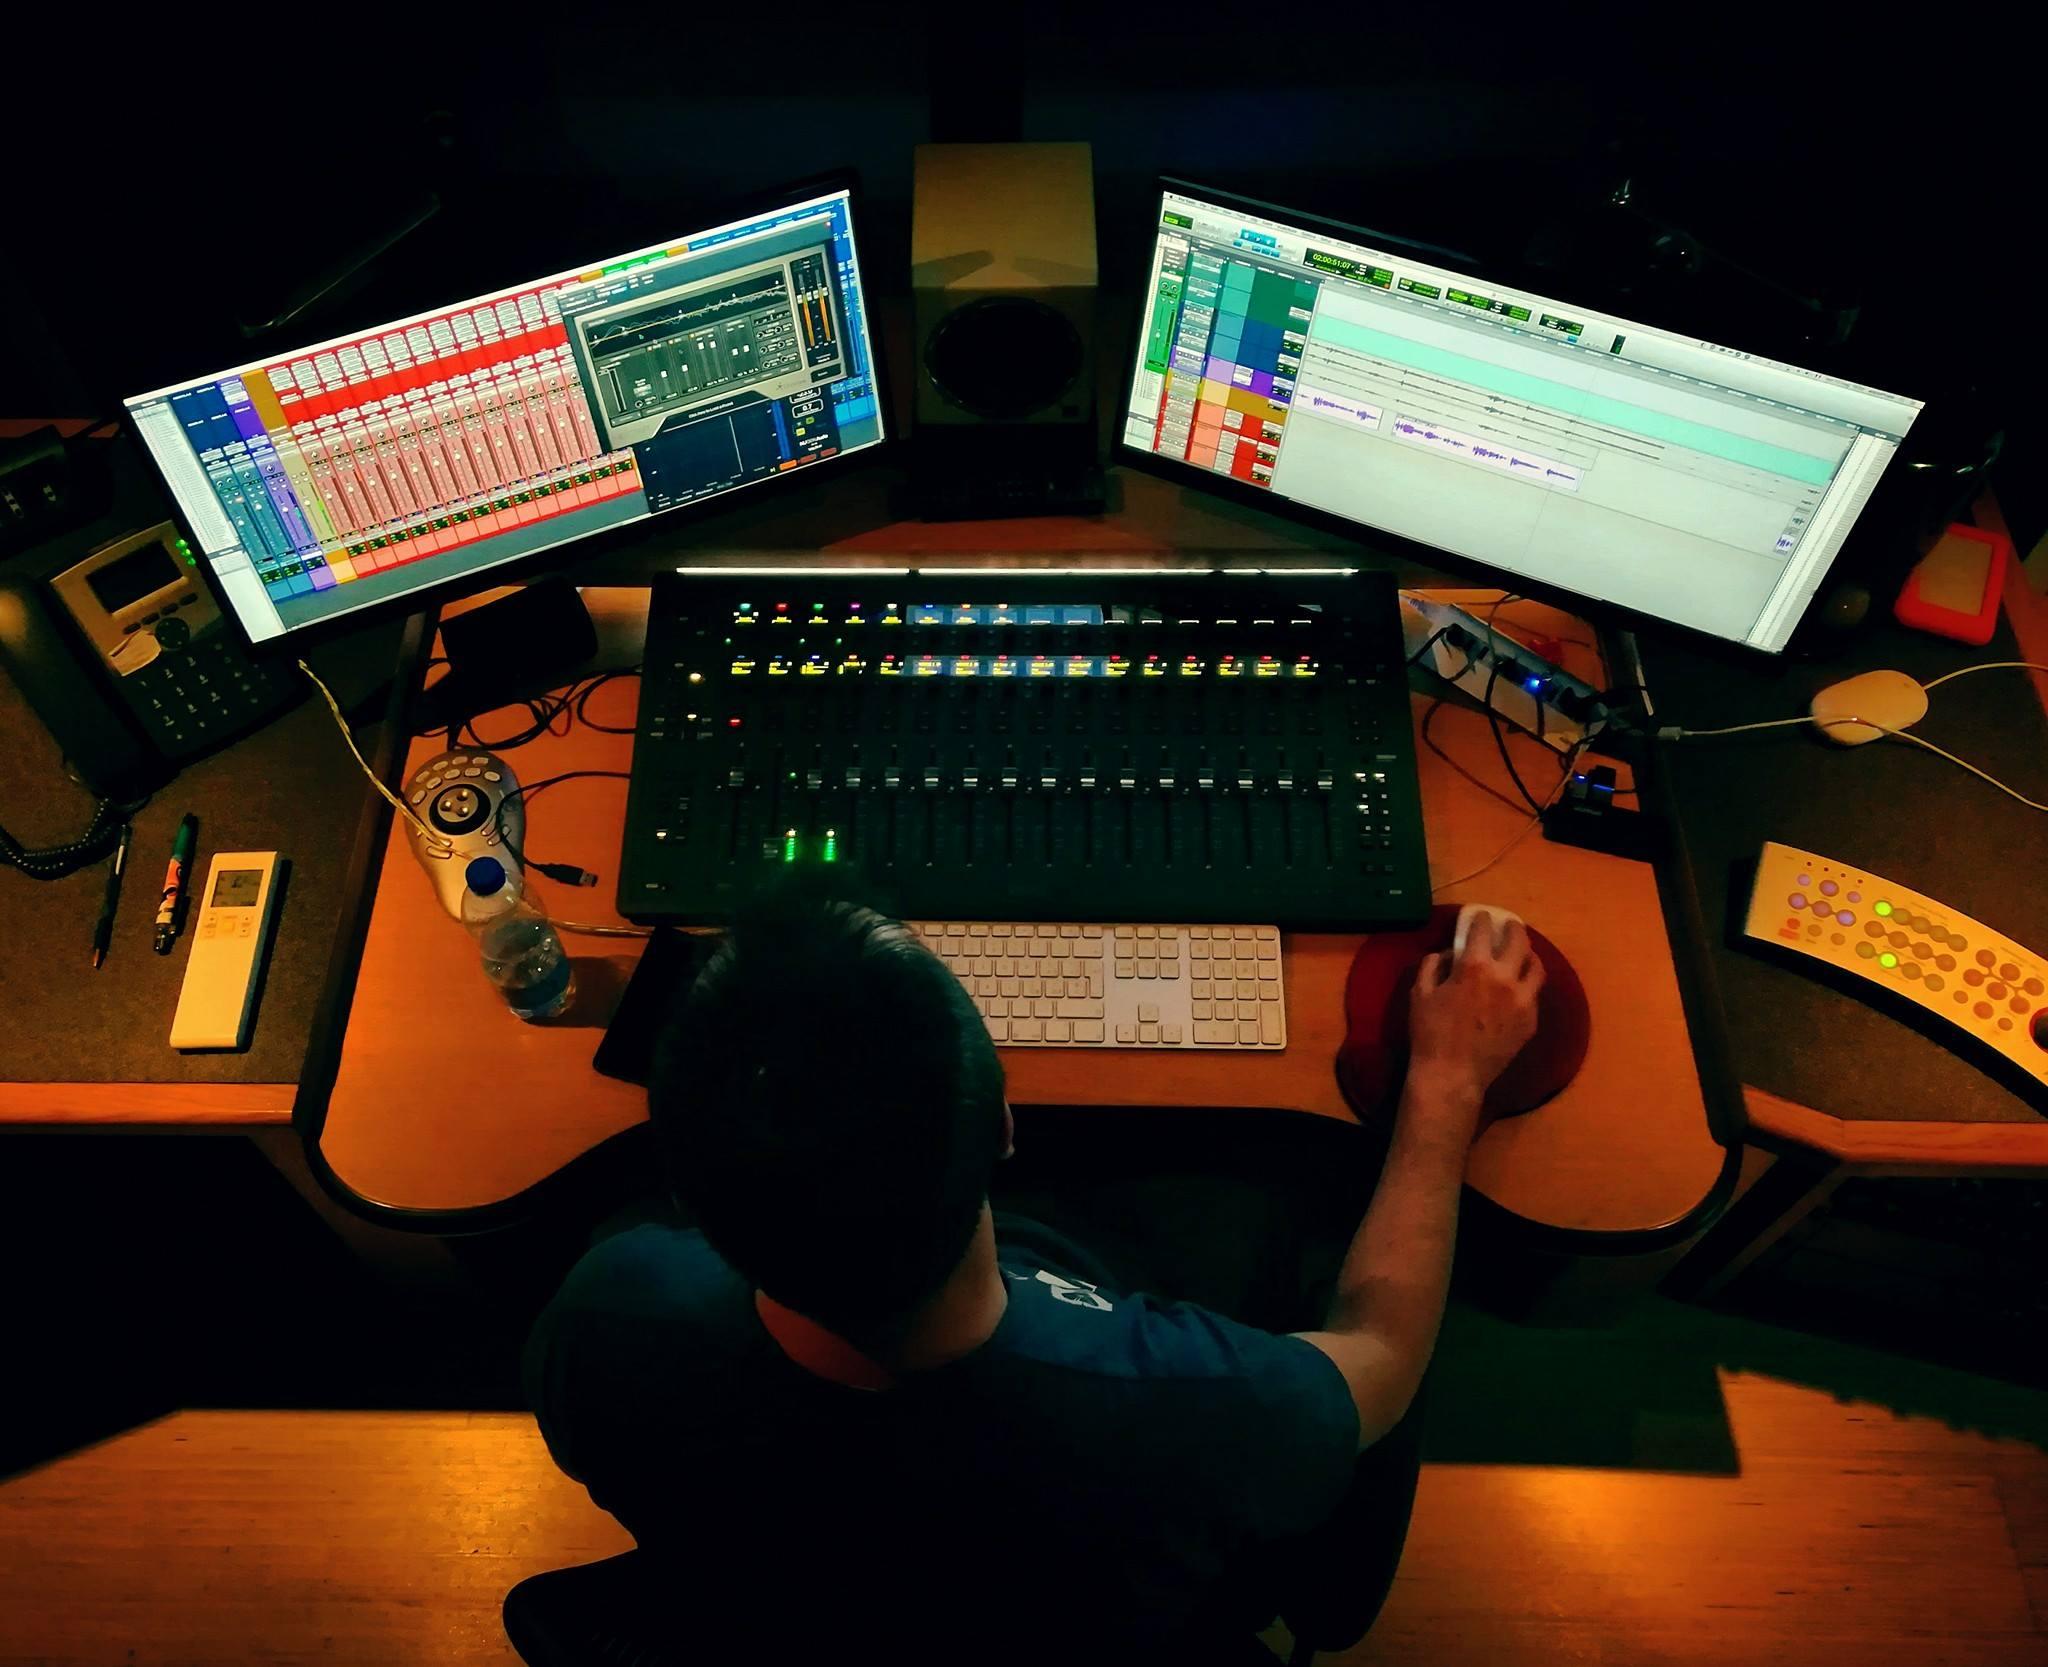 Unidentified Sound Object - Sound Effects Libraries - Sound Design - Matteo Milani - Torrevado